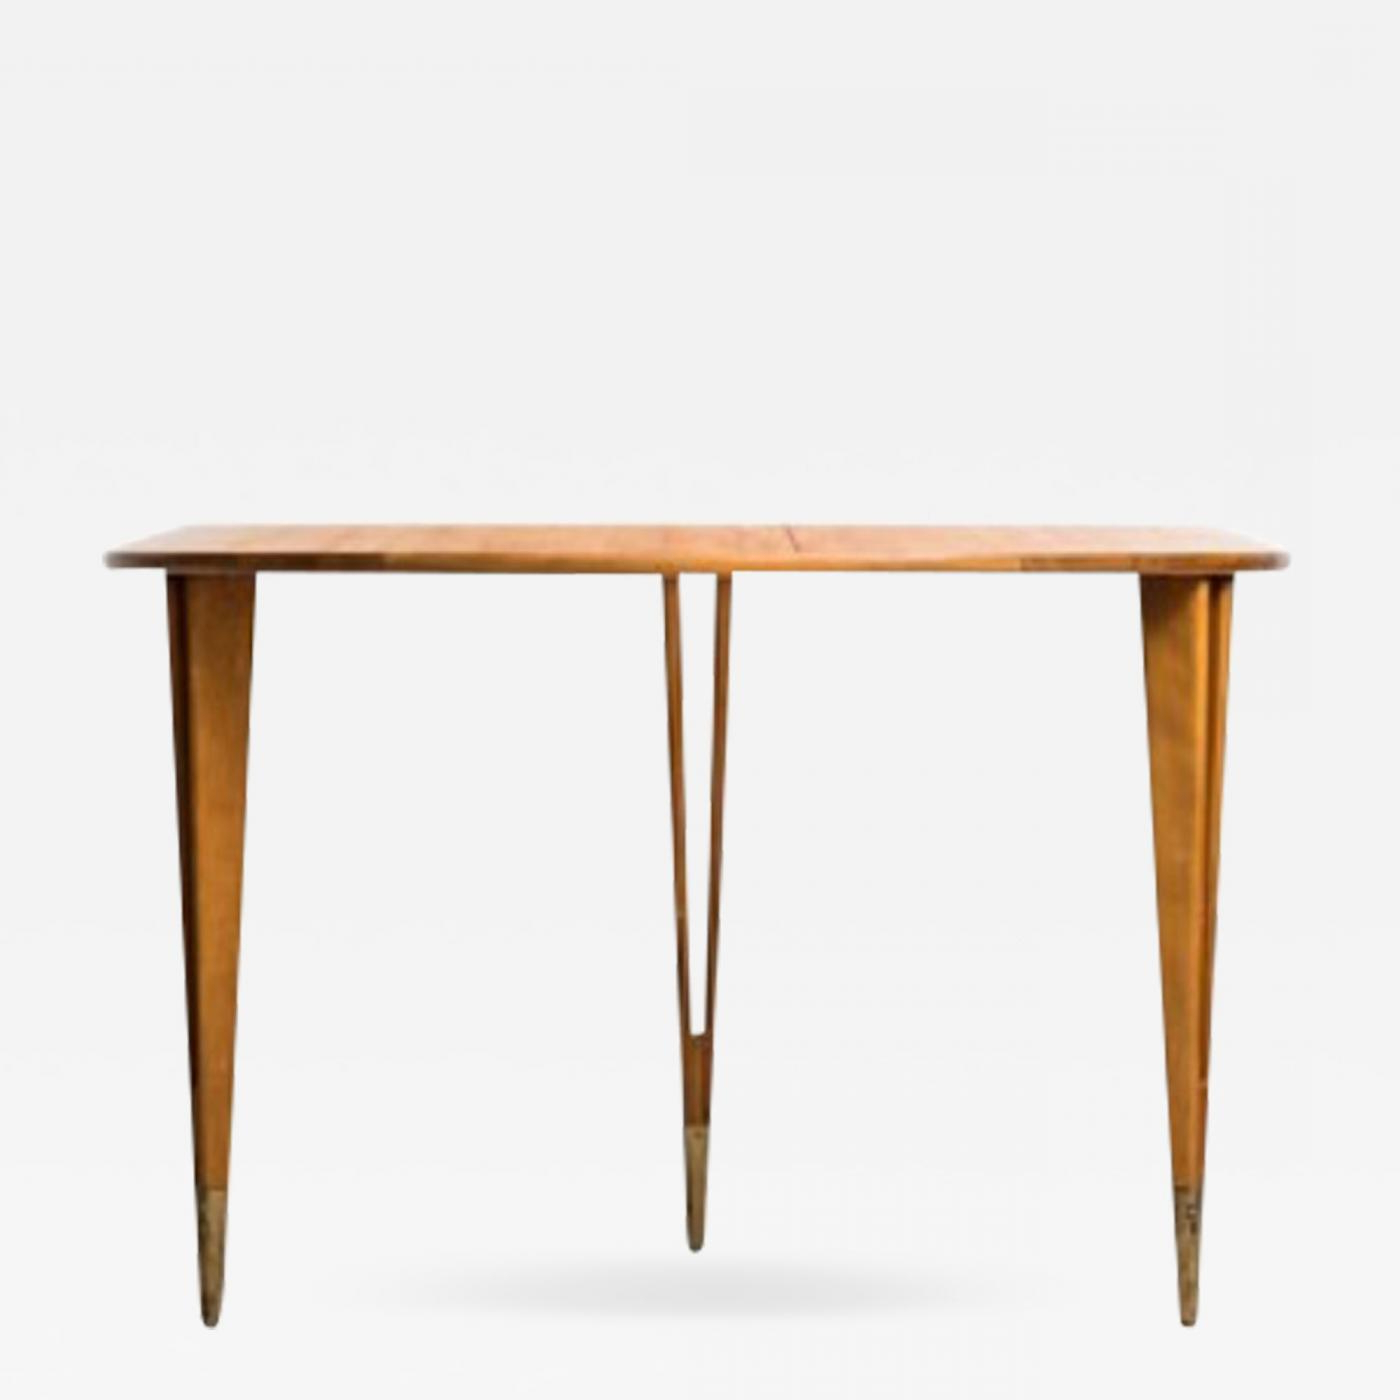 Bertil Fridhagen – Bertil Fridhagen Coffee Table Inside Intarsia Console Tables (View 5 of 20)